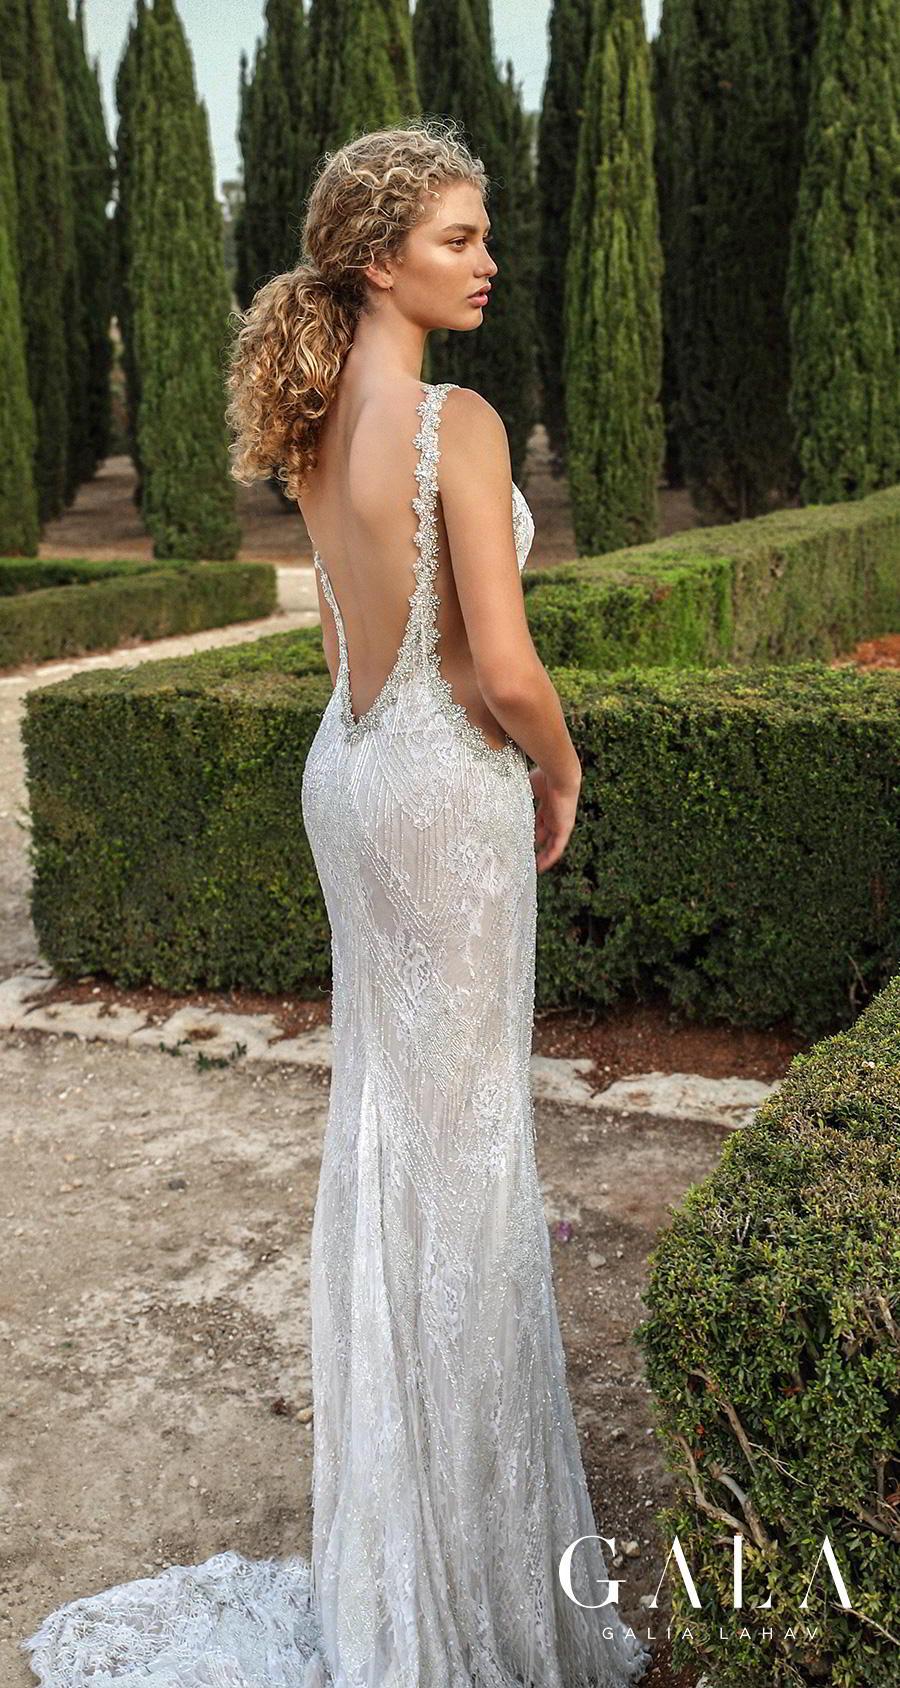 galia lahav gala fall 2019 bridal sleeveless illusion bateau deep v neck full embellishment open side glitzy glamorous elegant sheath wedding dress backless low v back sweep train (208) bv